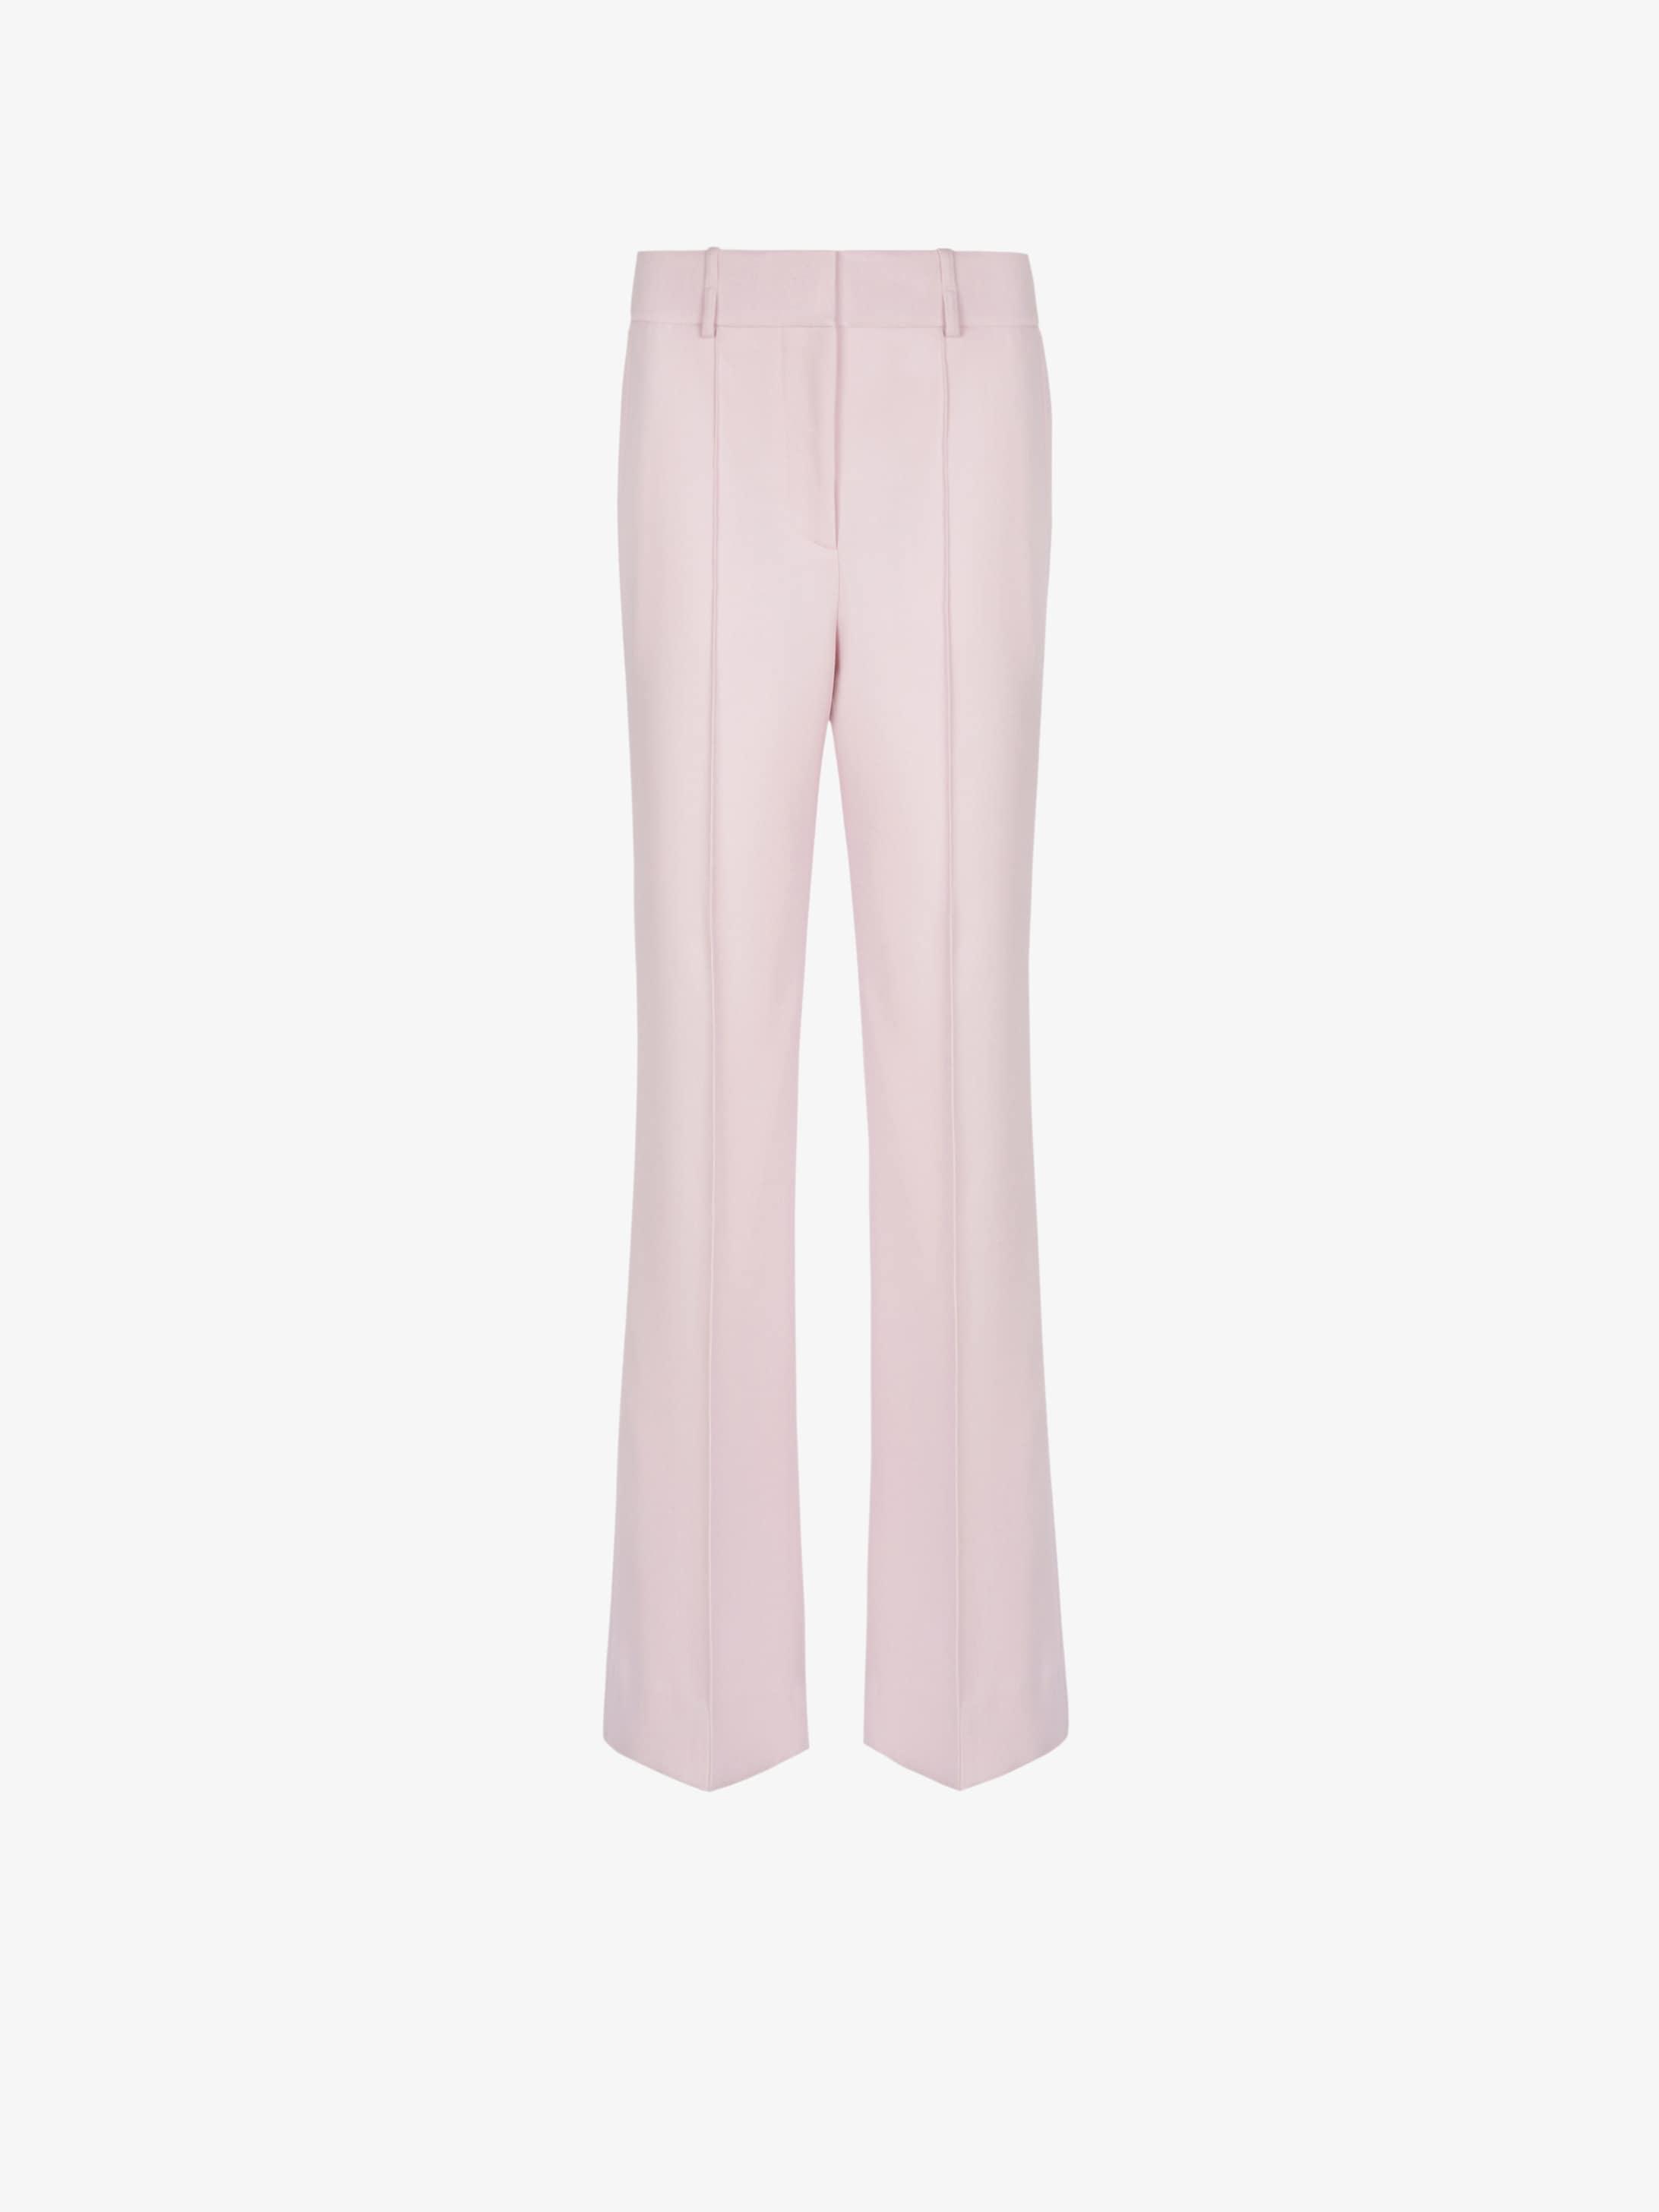 Pantaloni a vita alta in drill di lana